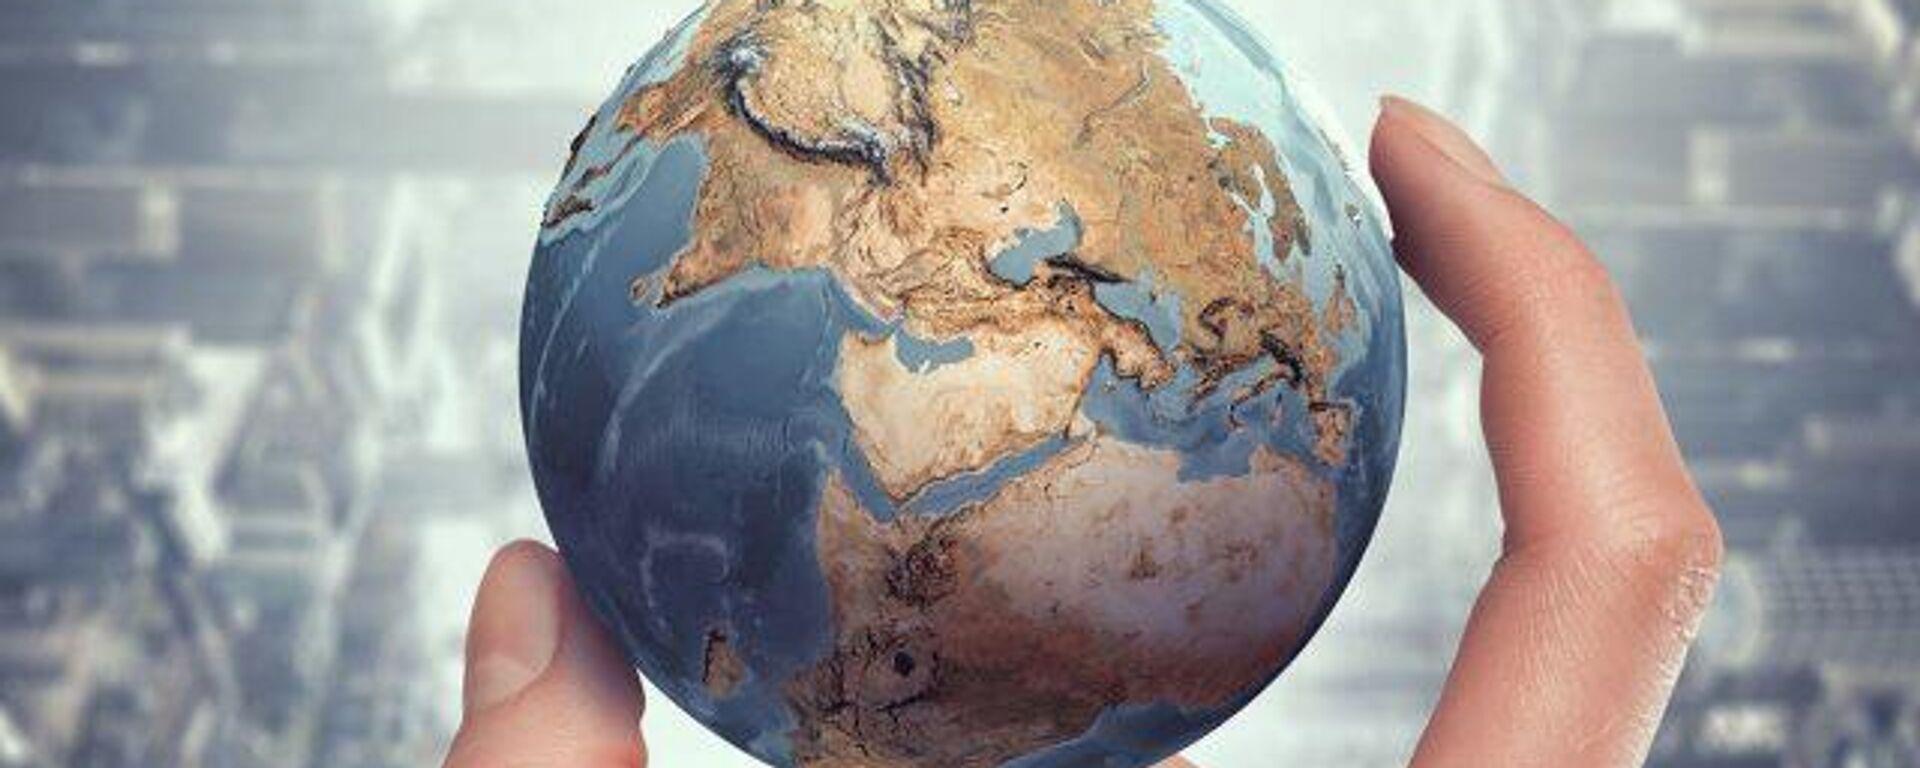 Ecuador: Lasso impulsa su agenda neoliberal - Sputnik Mundo, 1920, 24.09.2021